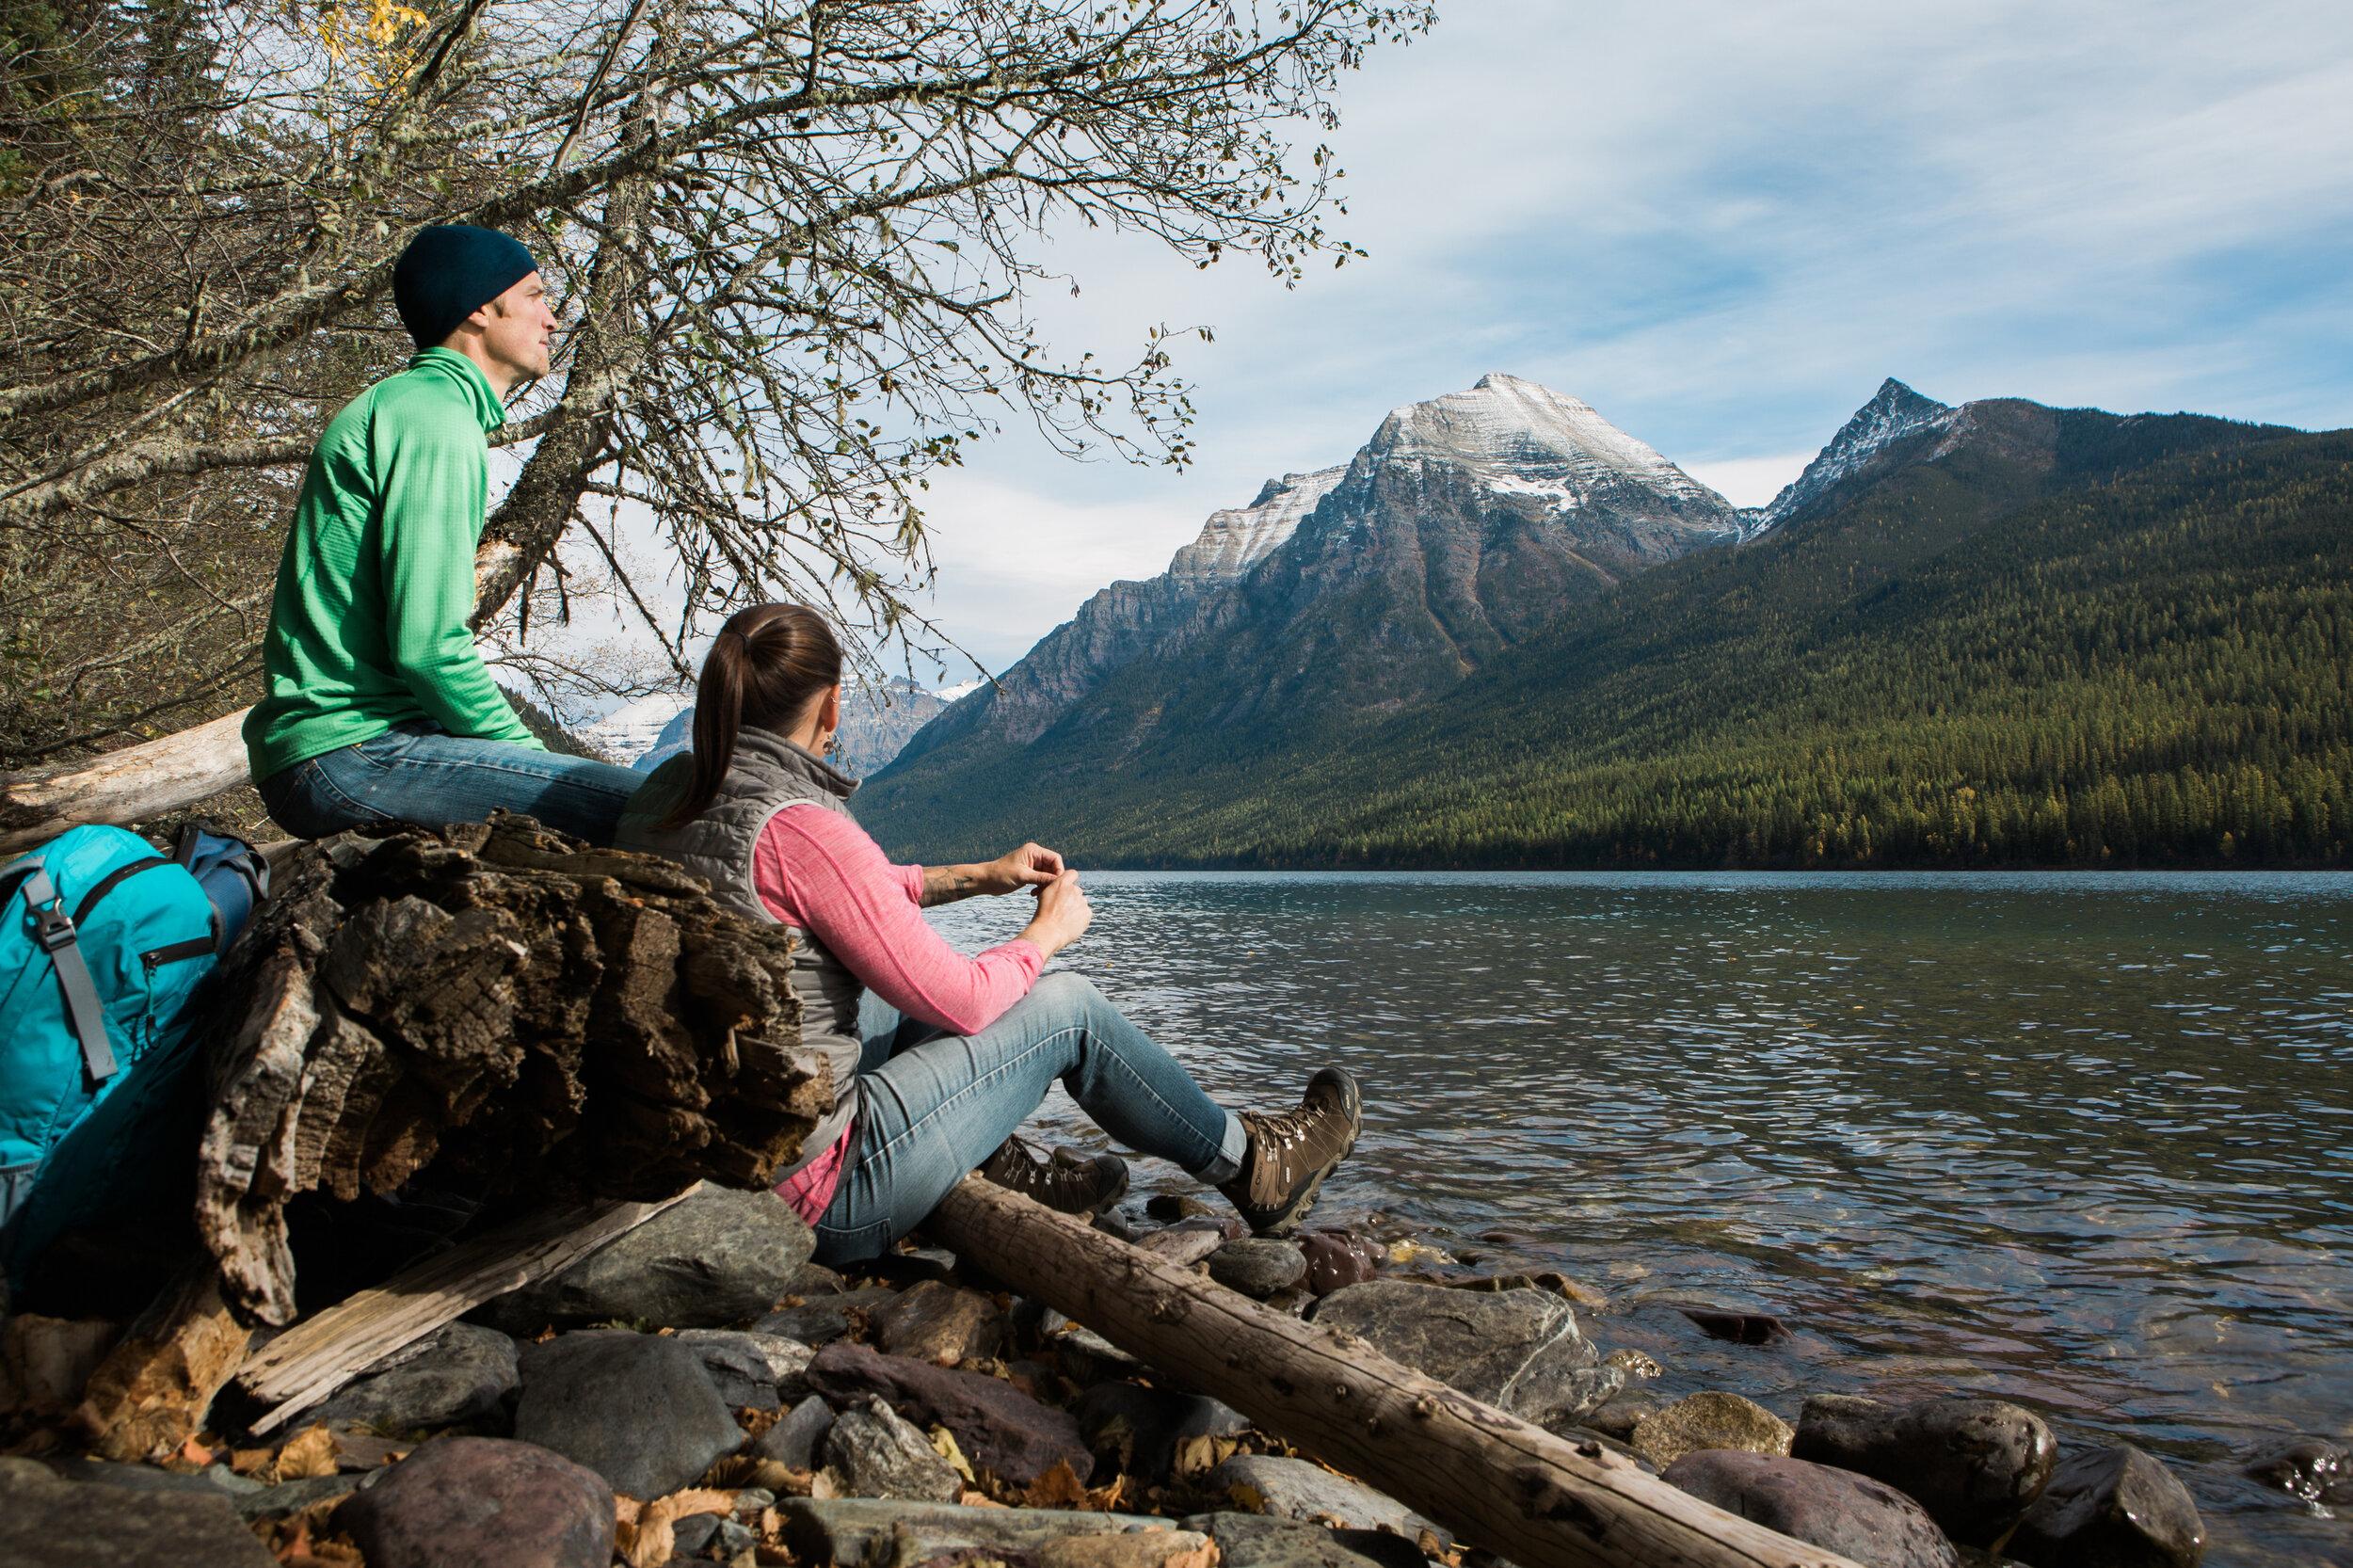 CindyGiovagnoli_Road_Trip_Travel_National_Parks_Explore_America-042.jpg